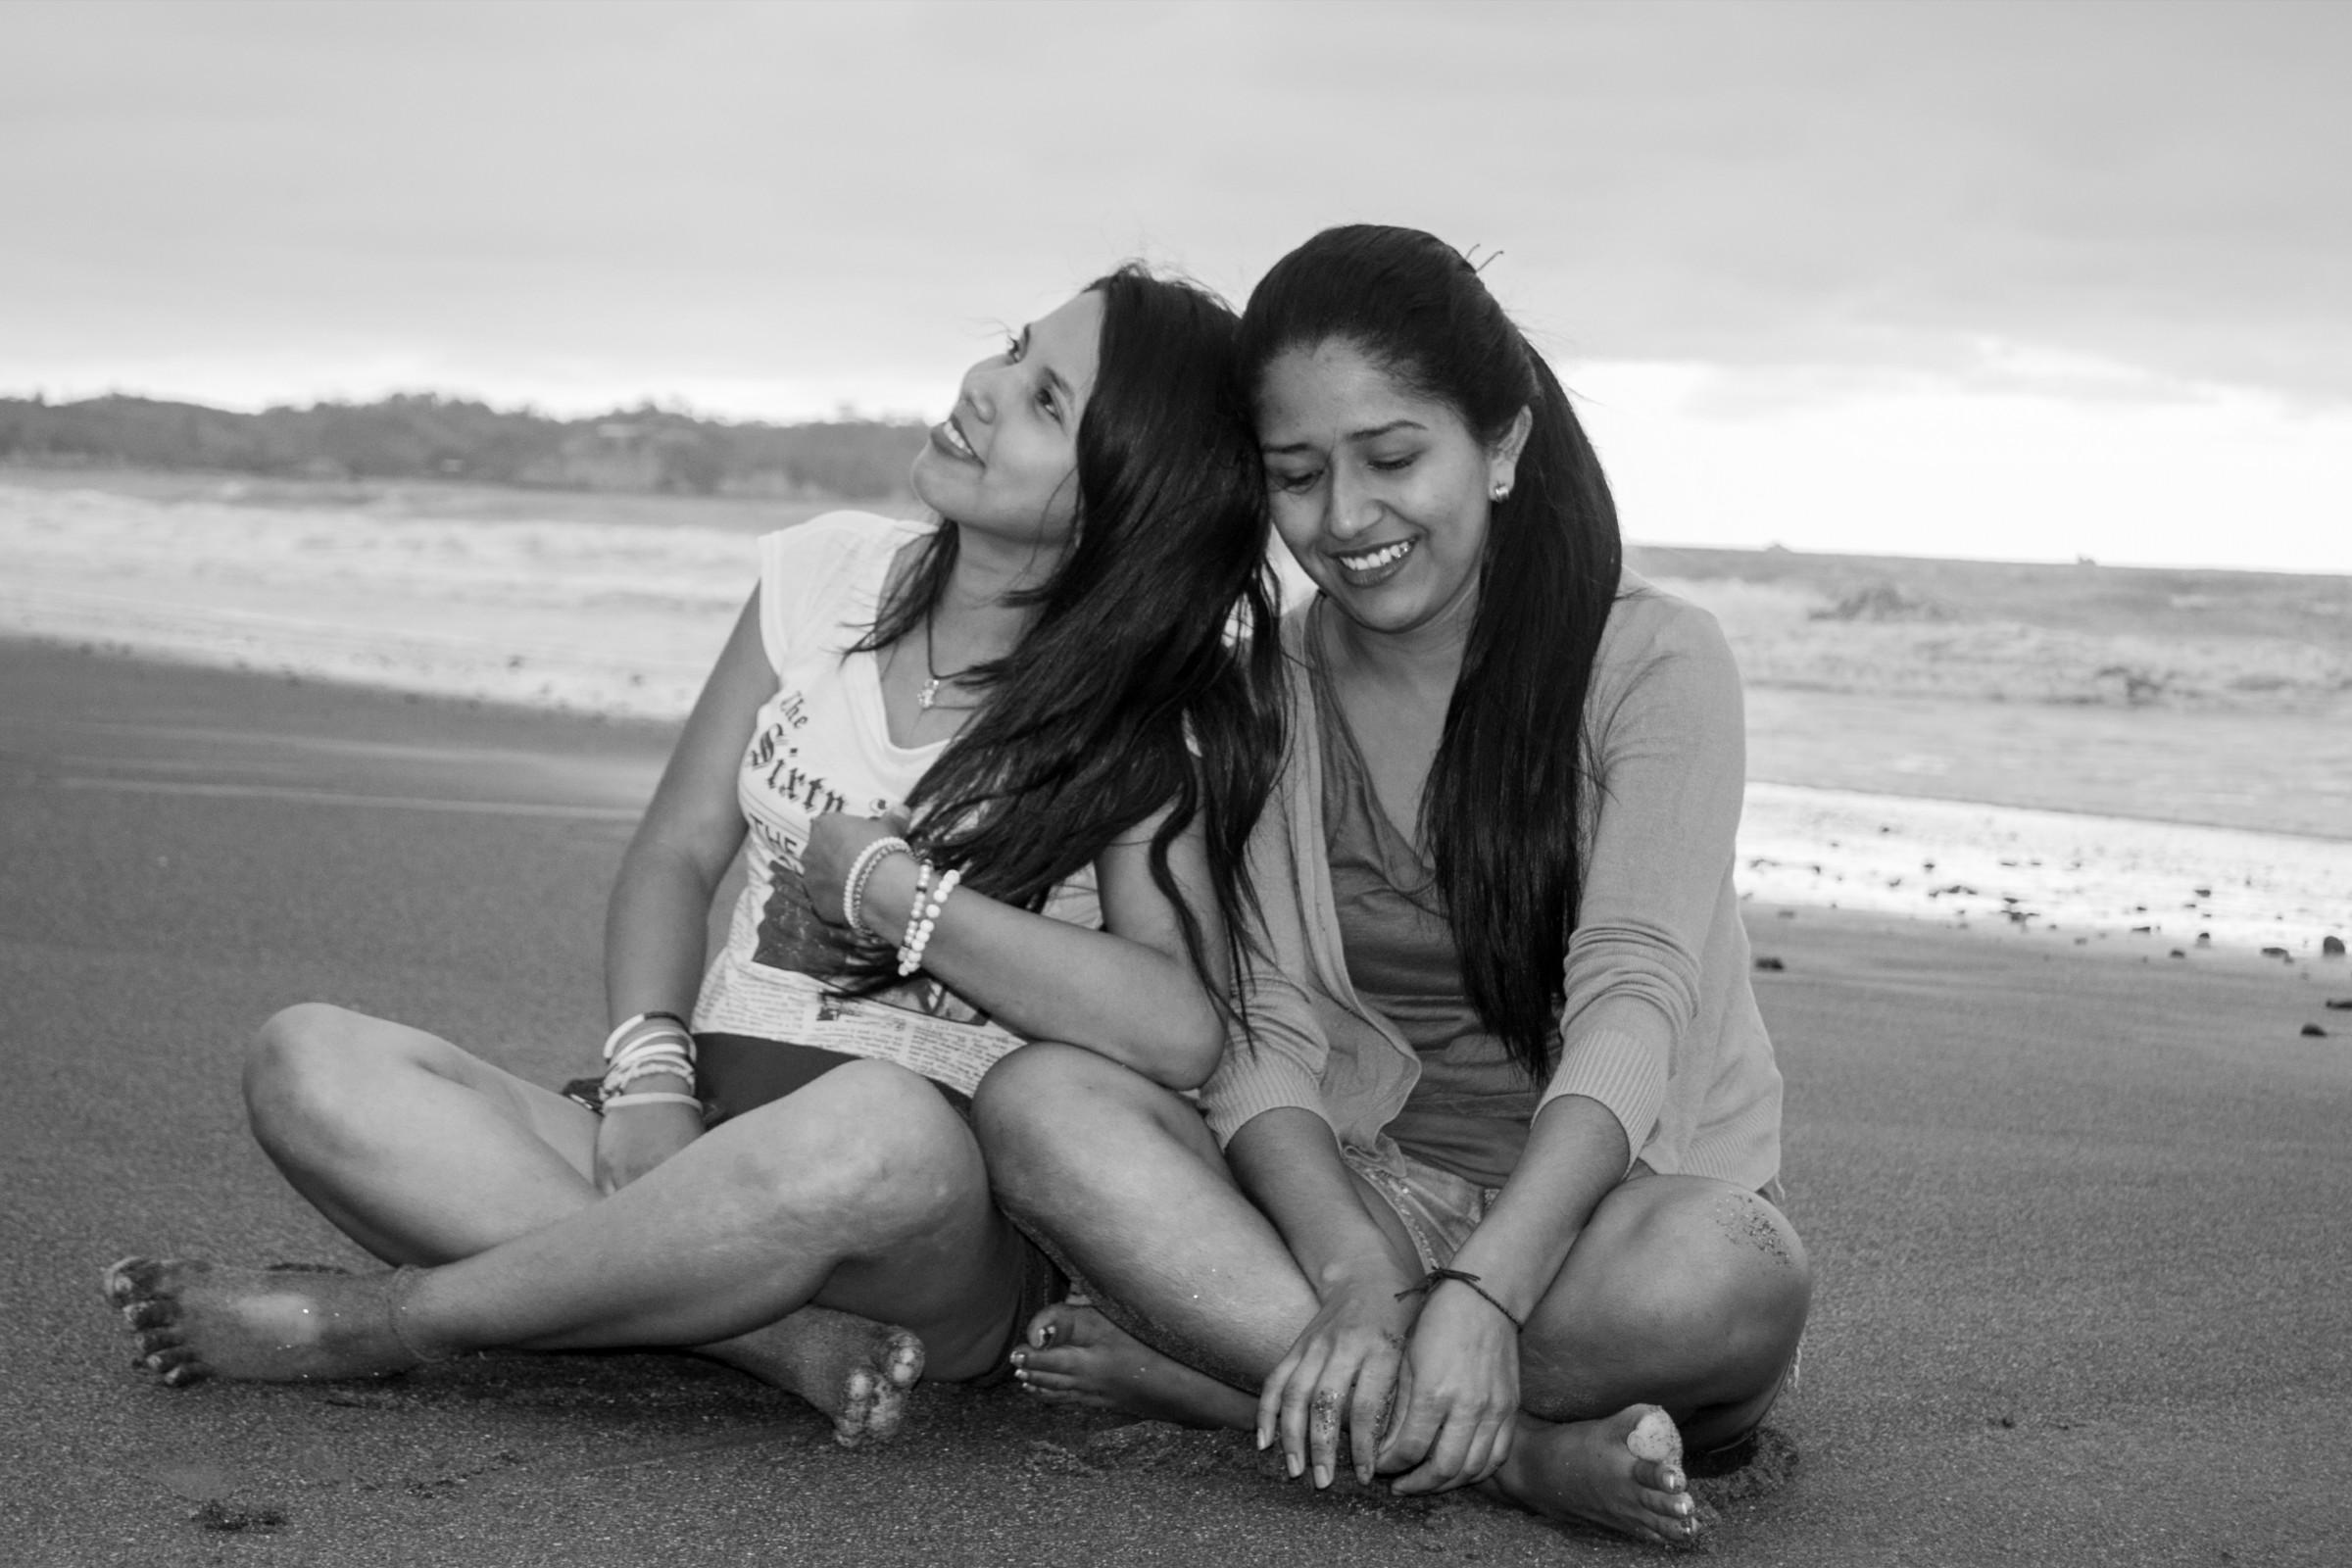 Sesión Fotográfica | Tania & Diana